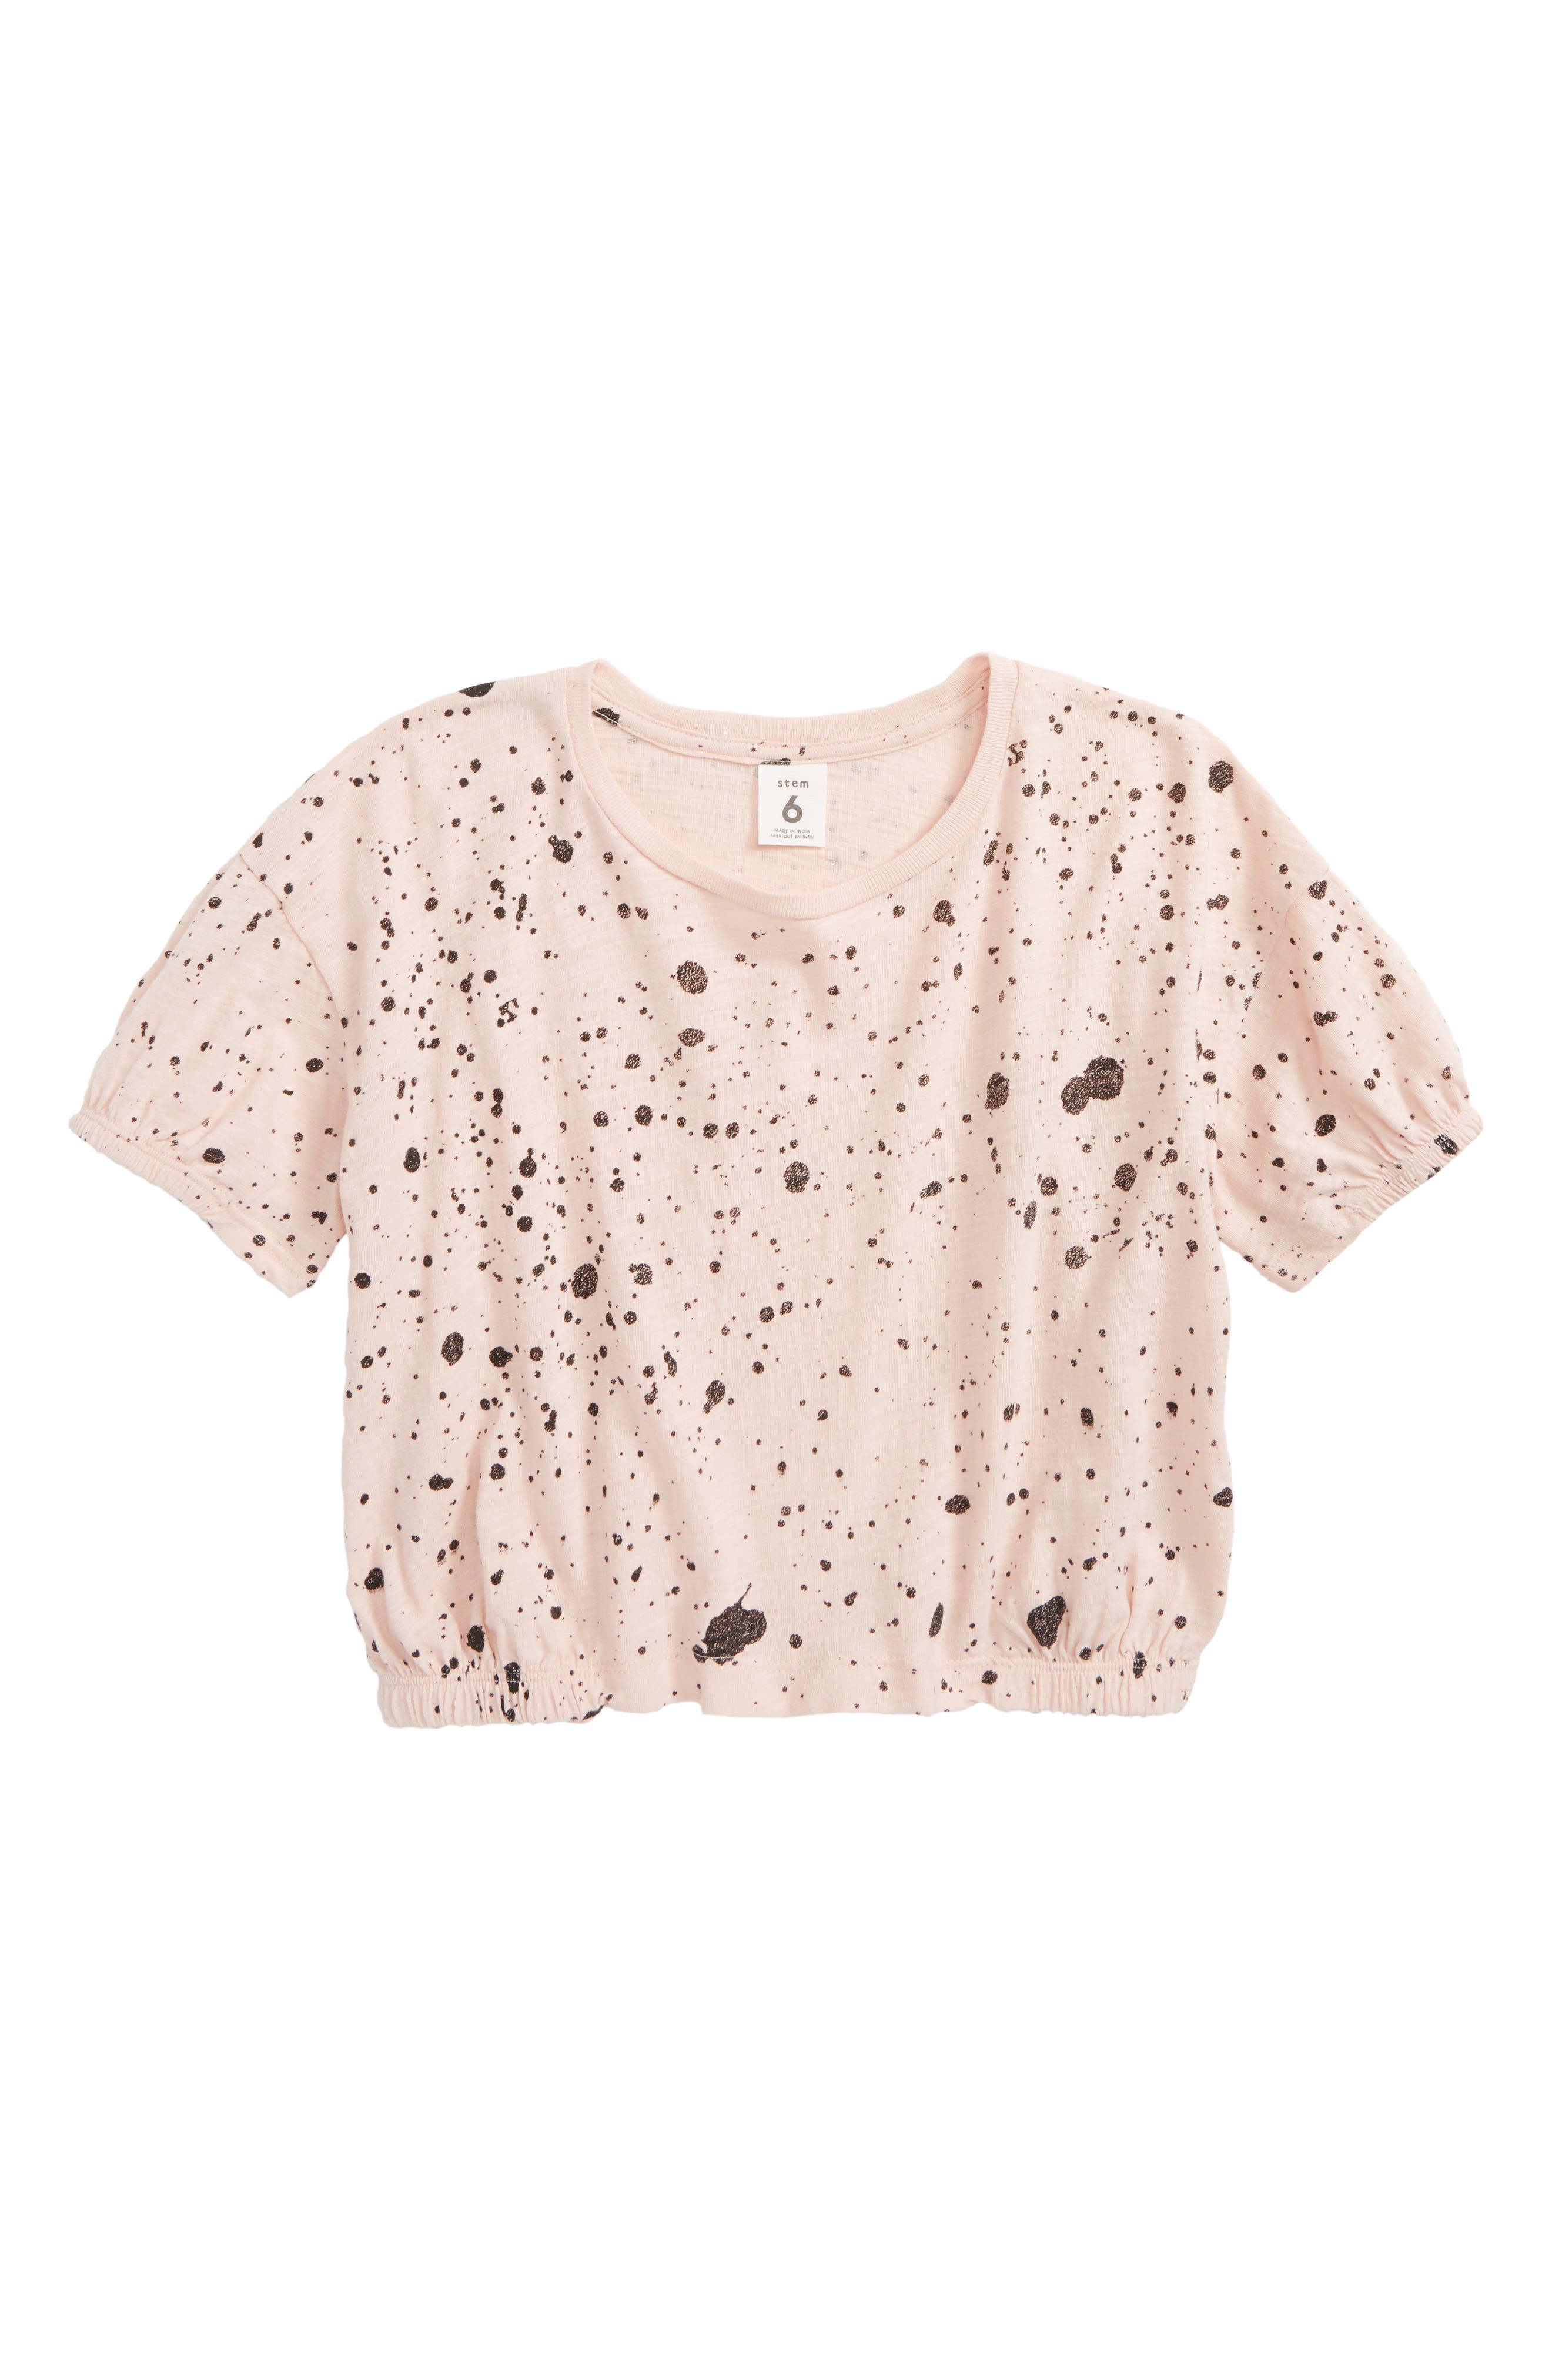 Gathered Sleeve Tee,                         Main,                         color, Pink Smoke Paint Splatter